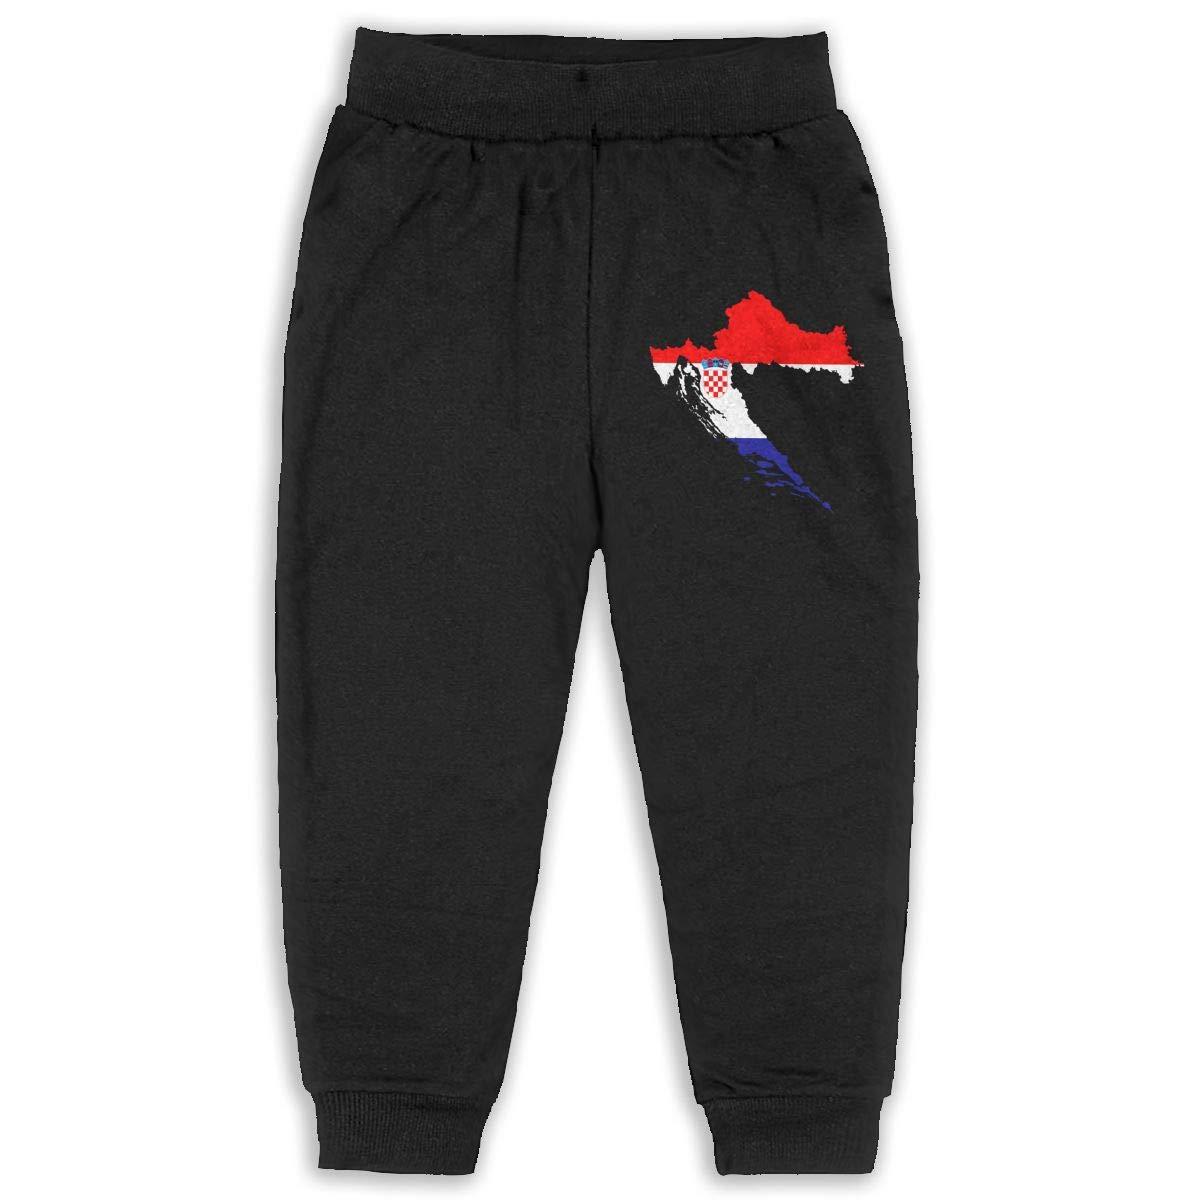 Fleece Active Joggers Elastic Pants DaXi1 Croatia Sweatpants for Boys /& Girls